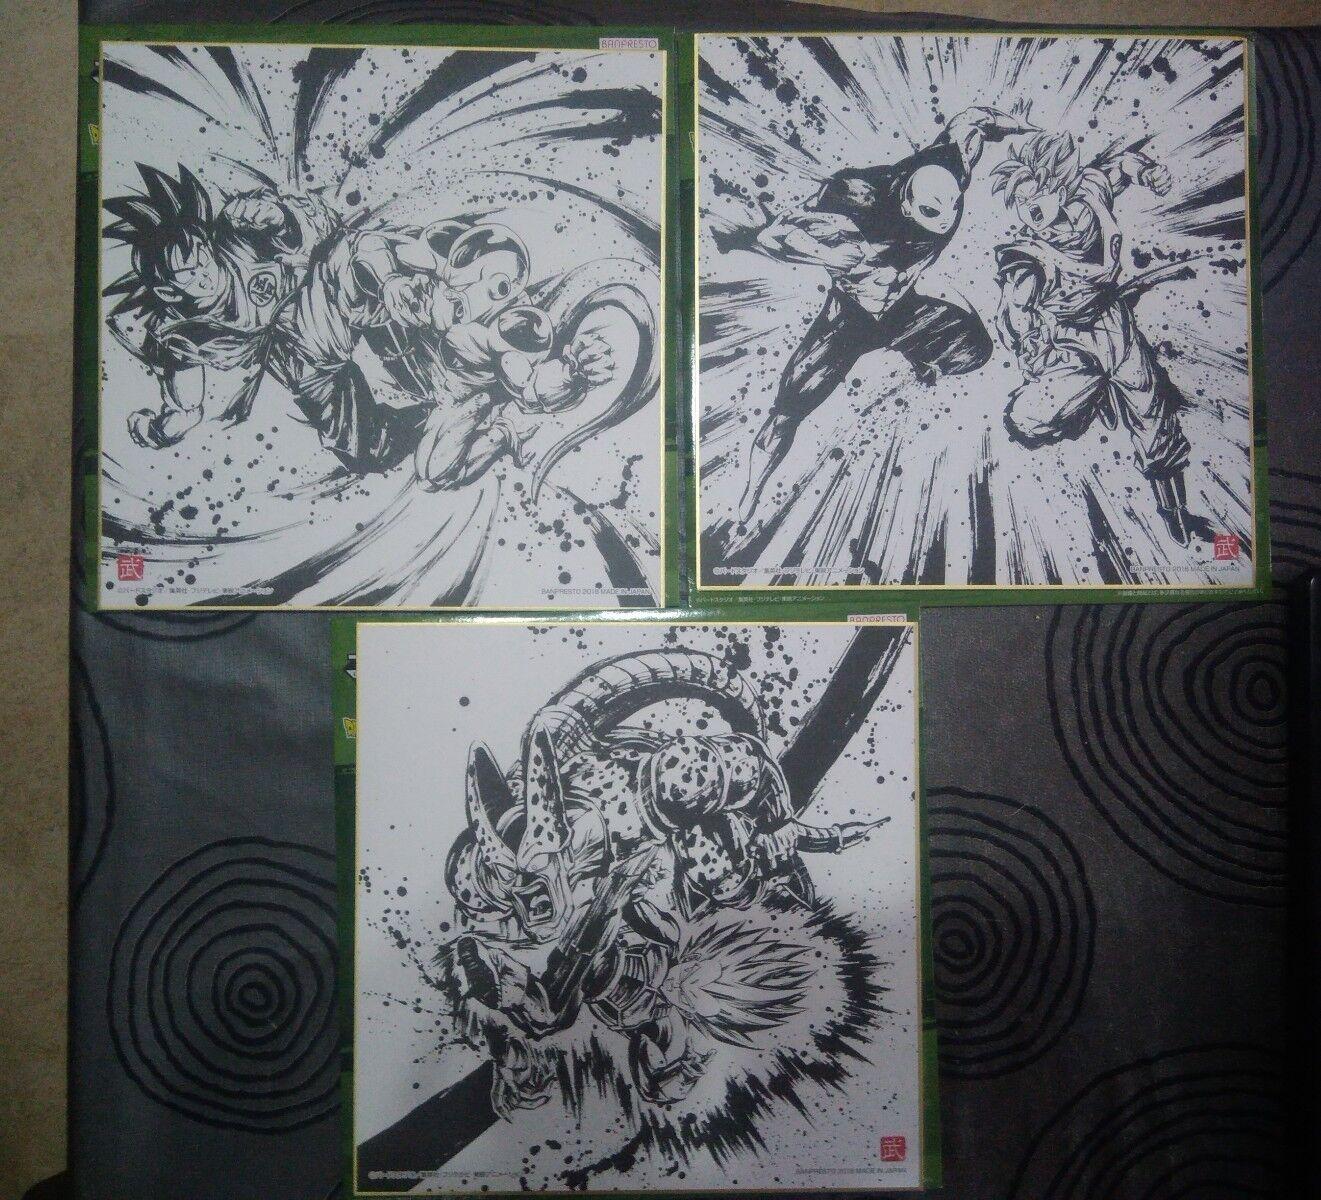 3 dragonball goku jiren vegeta cell freezer cartas shikishi 24x24cm bola de drac